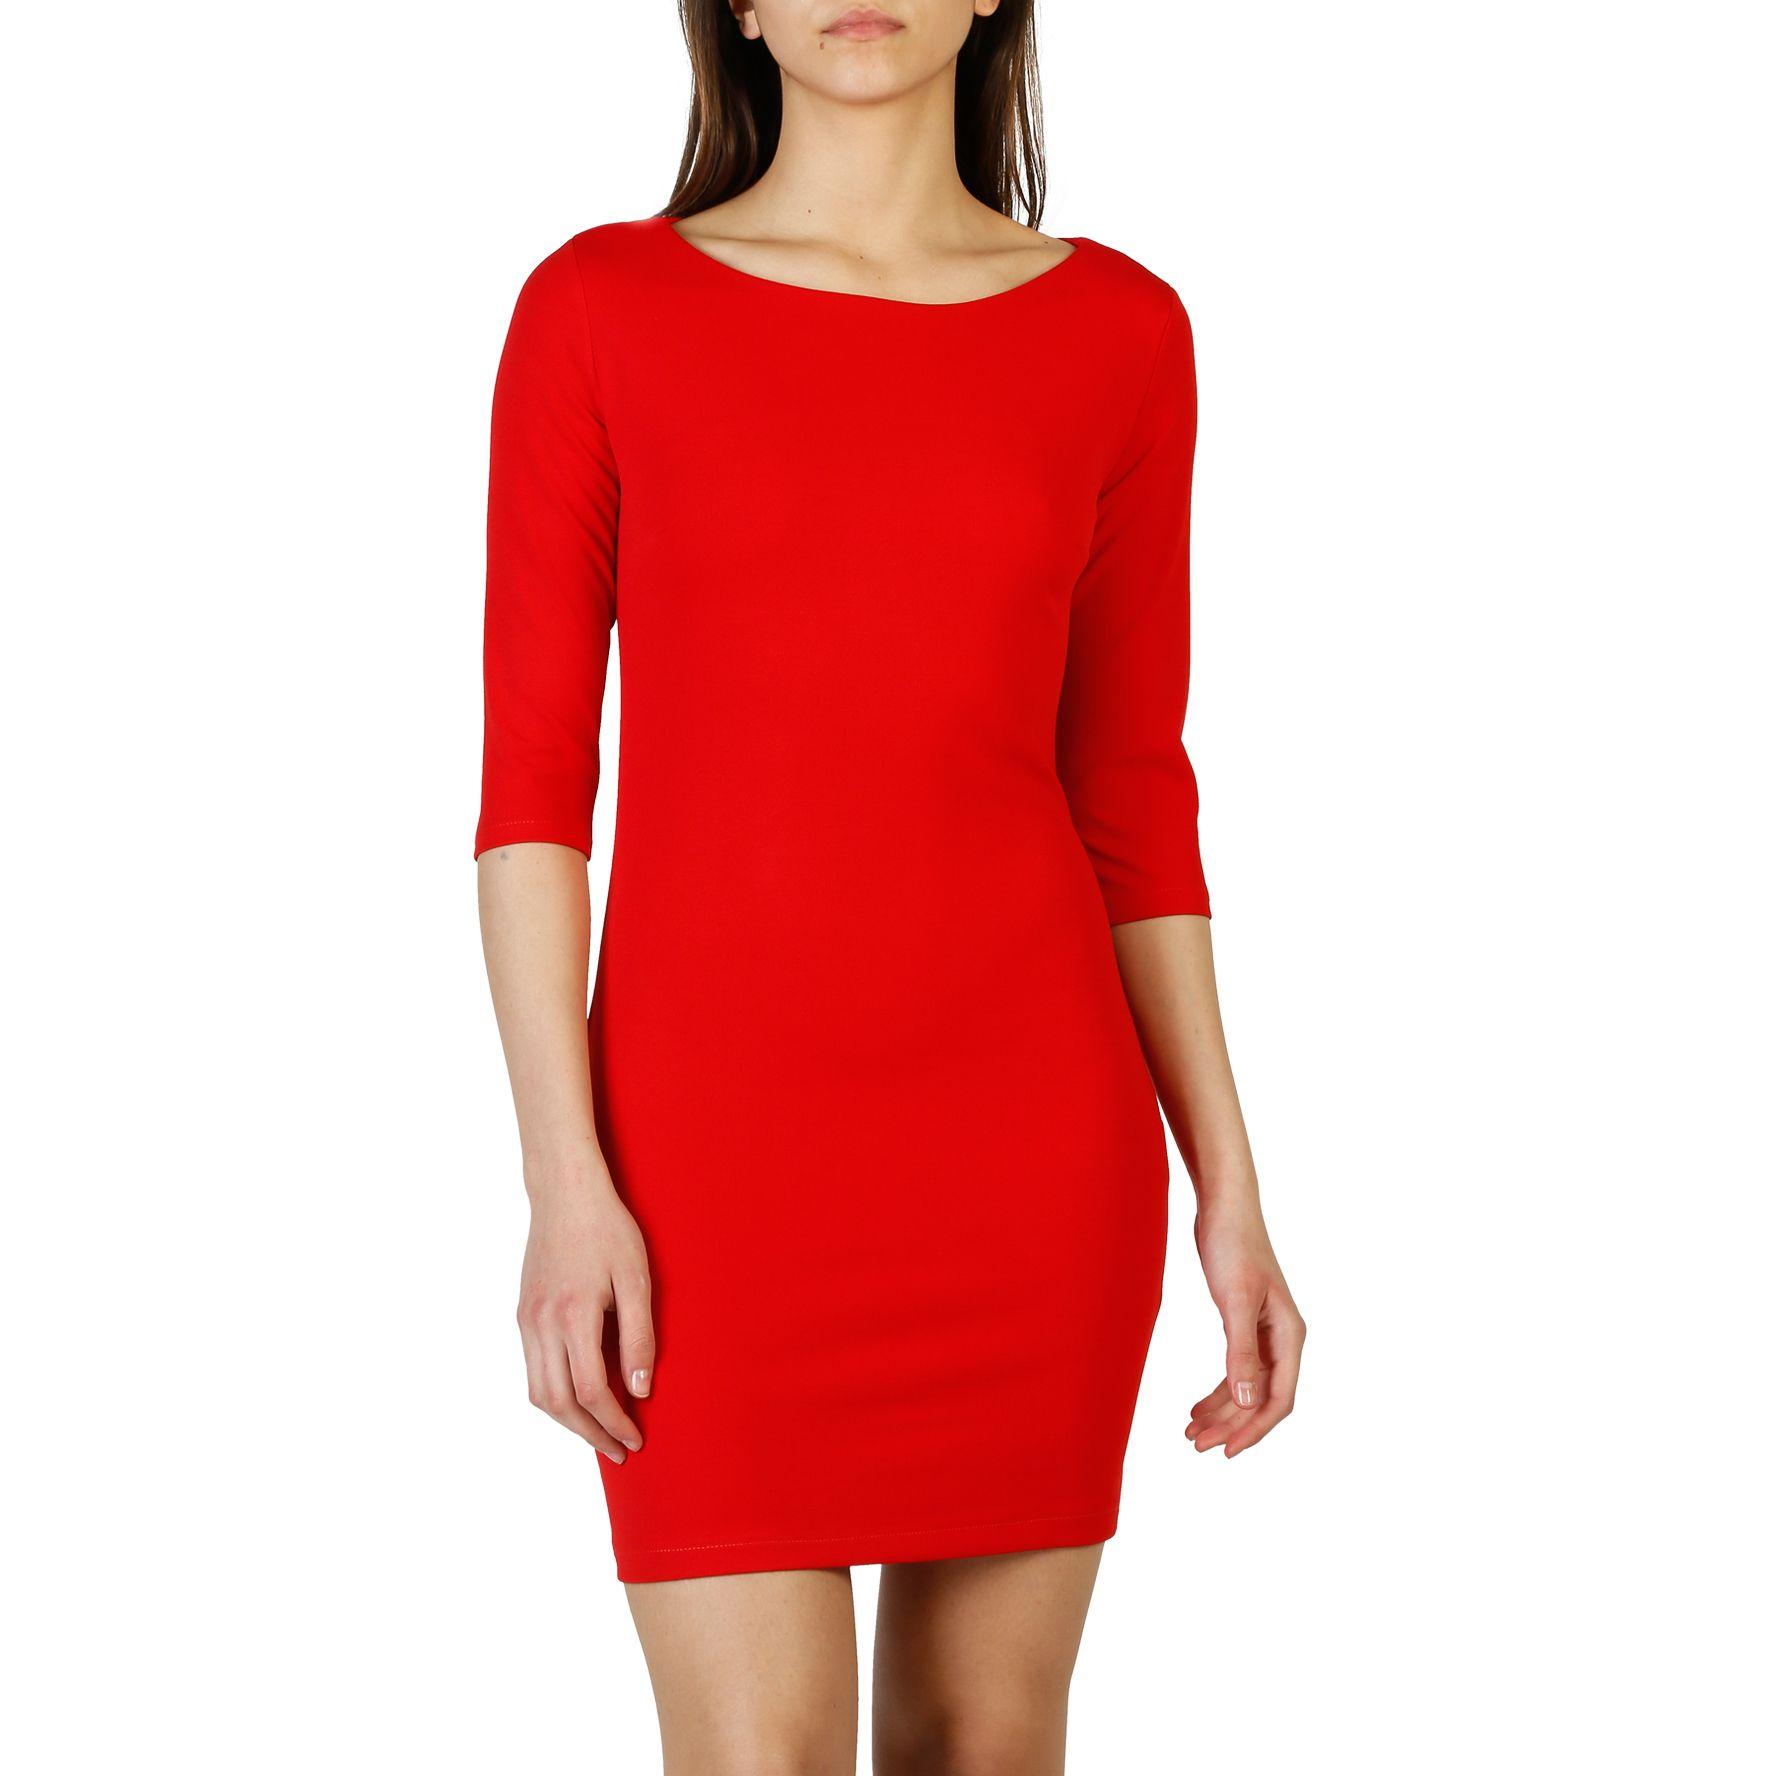 51409d49 Lokita Sukienka V2245 Red L - 7423735806 - oficjalne archiwum allegro